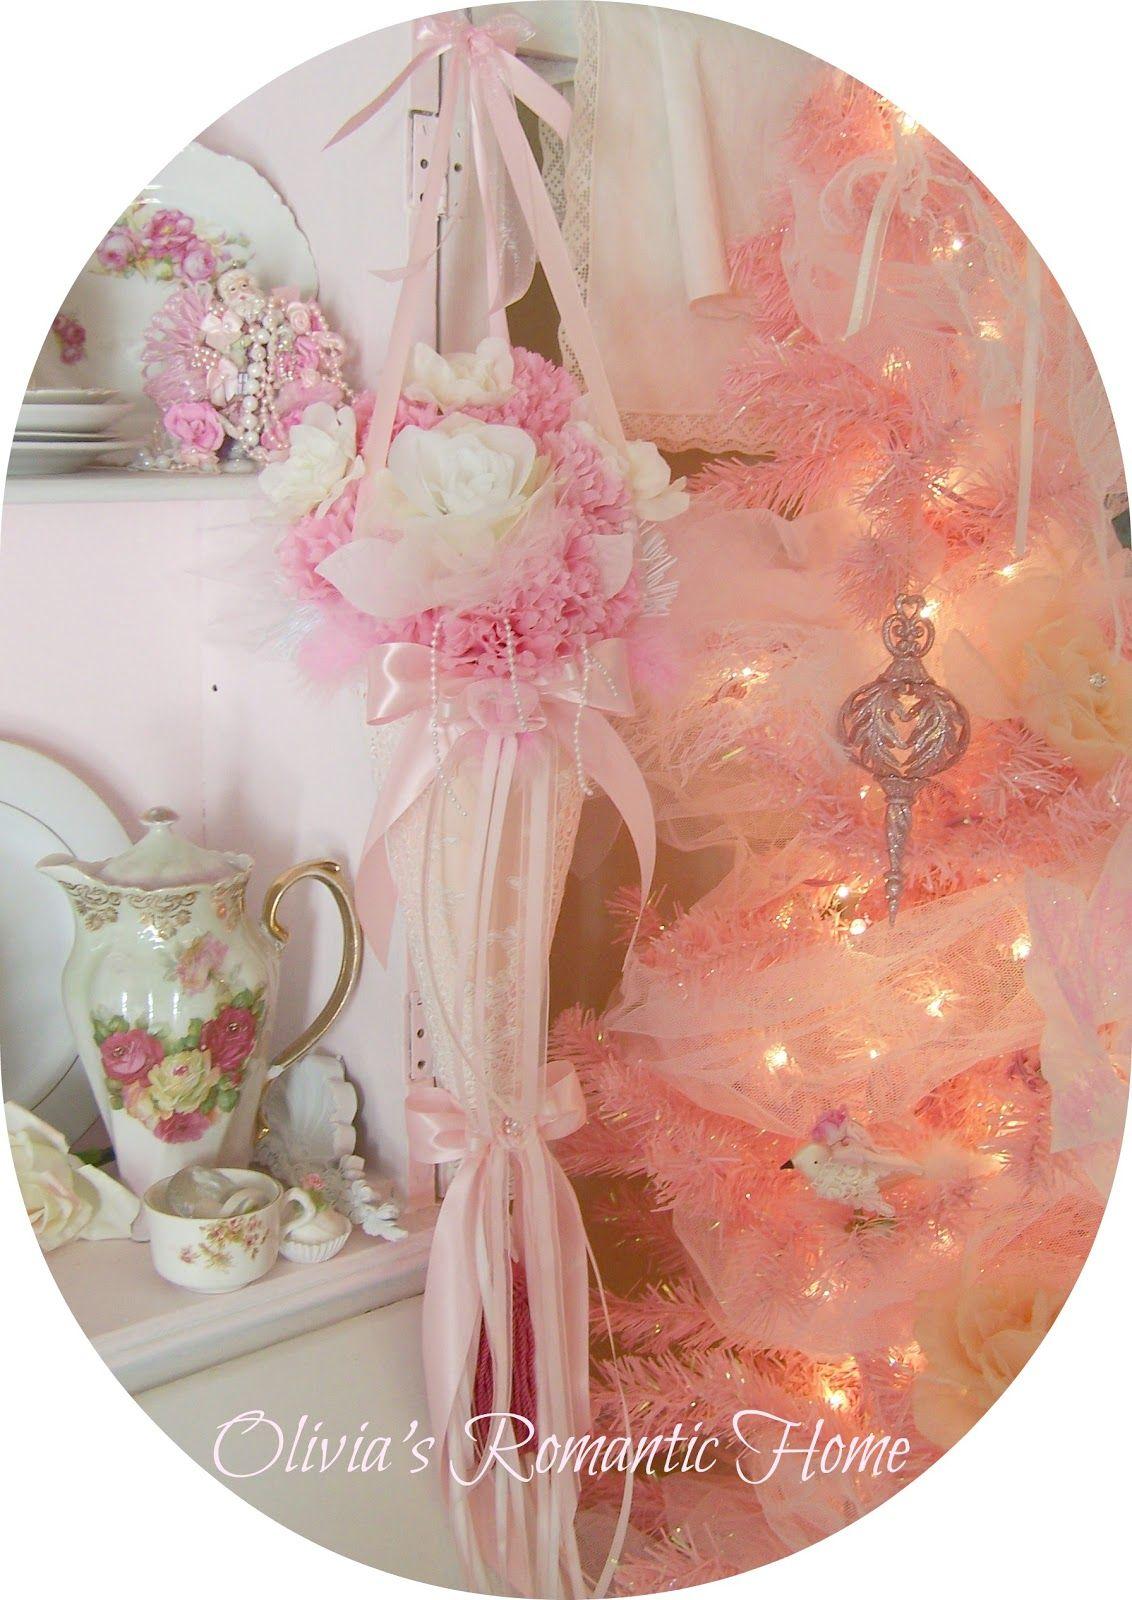 Olivia's Romantic Home   Pink Christmas   Pinterest ...